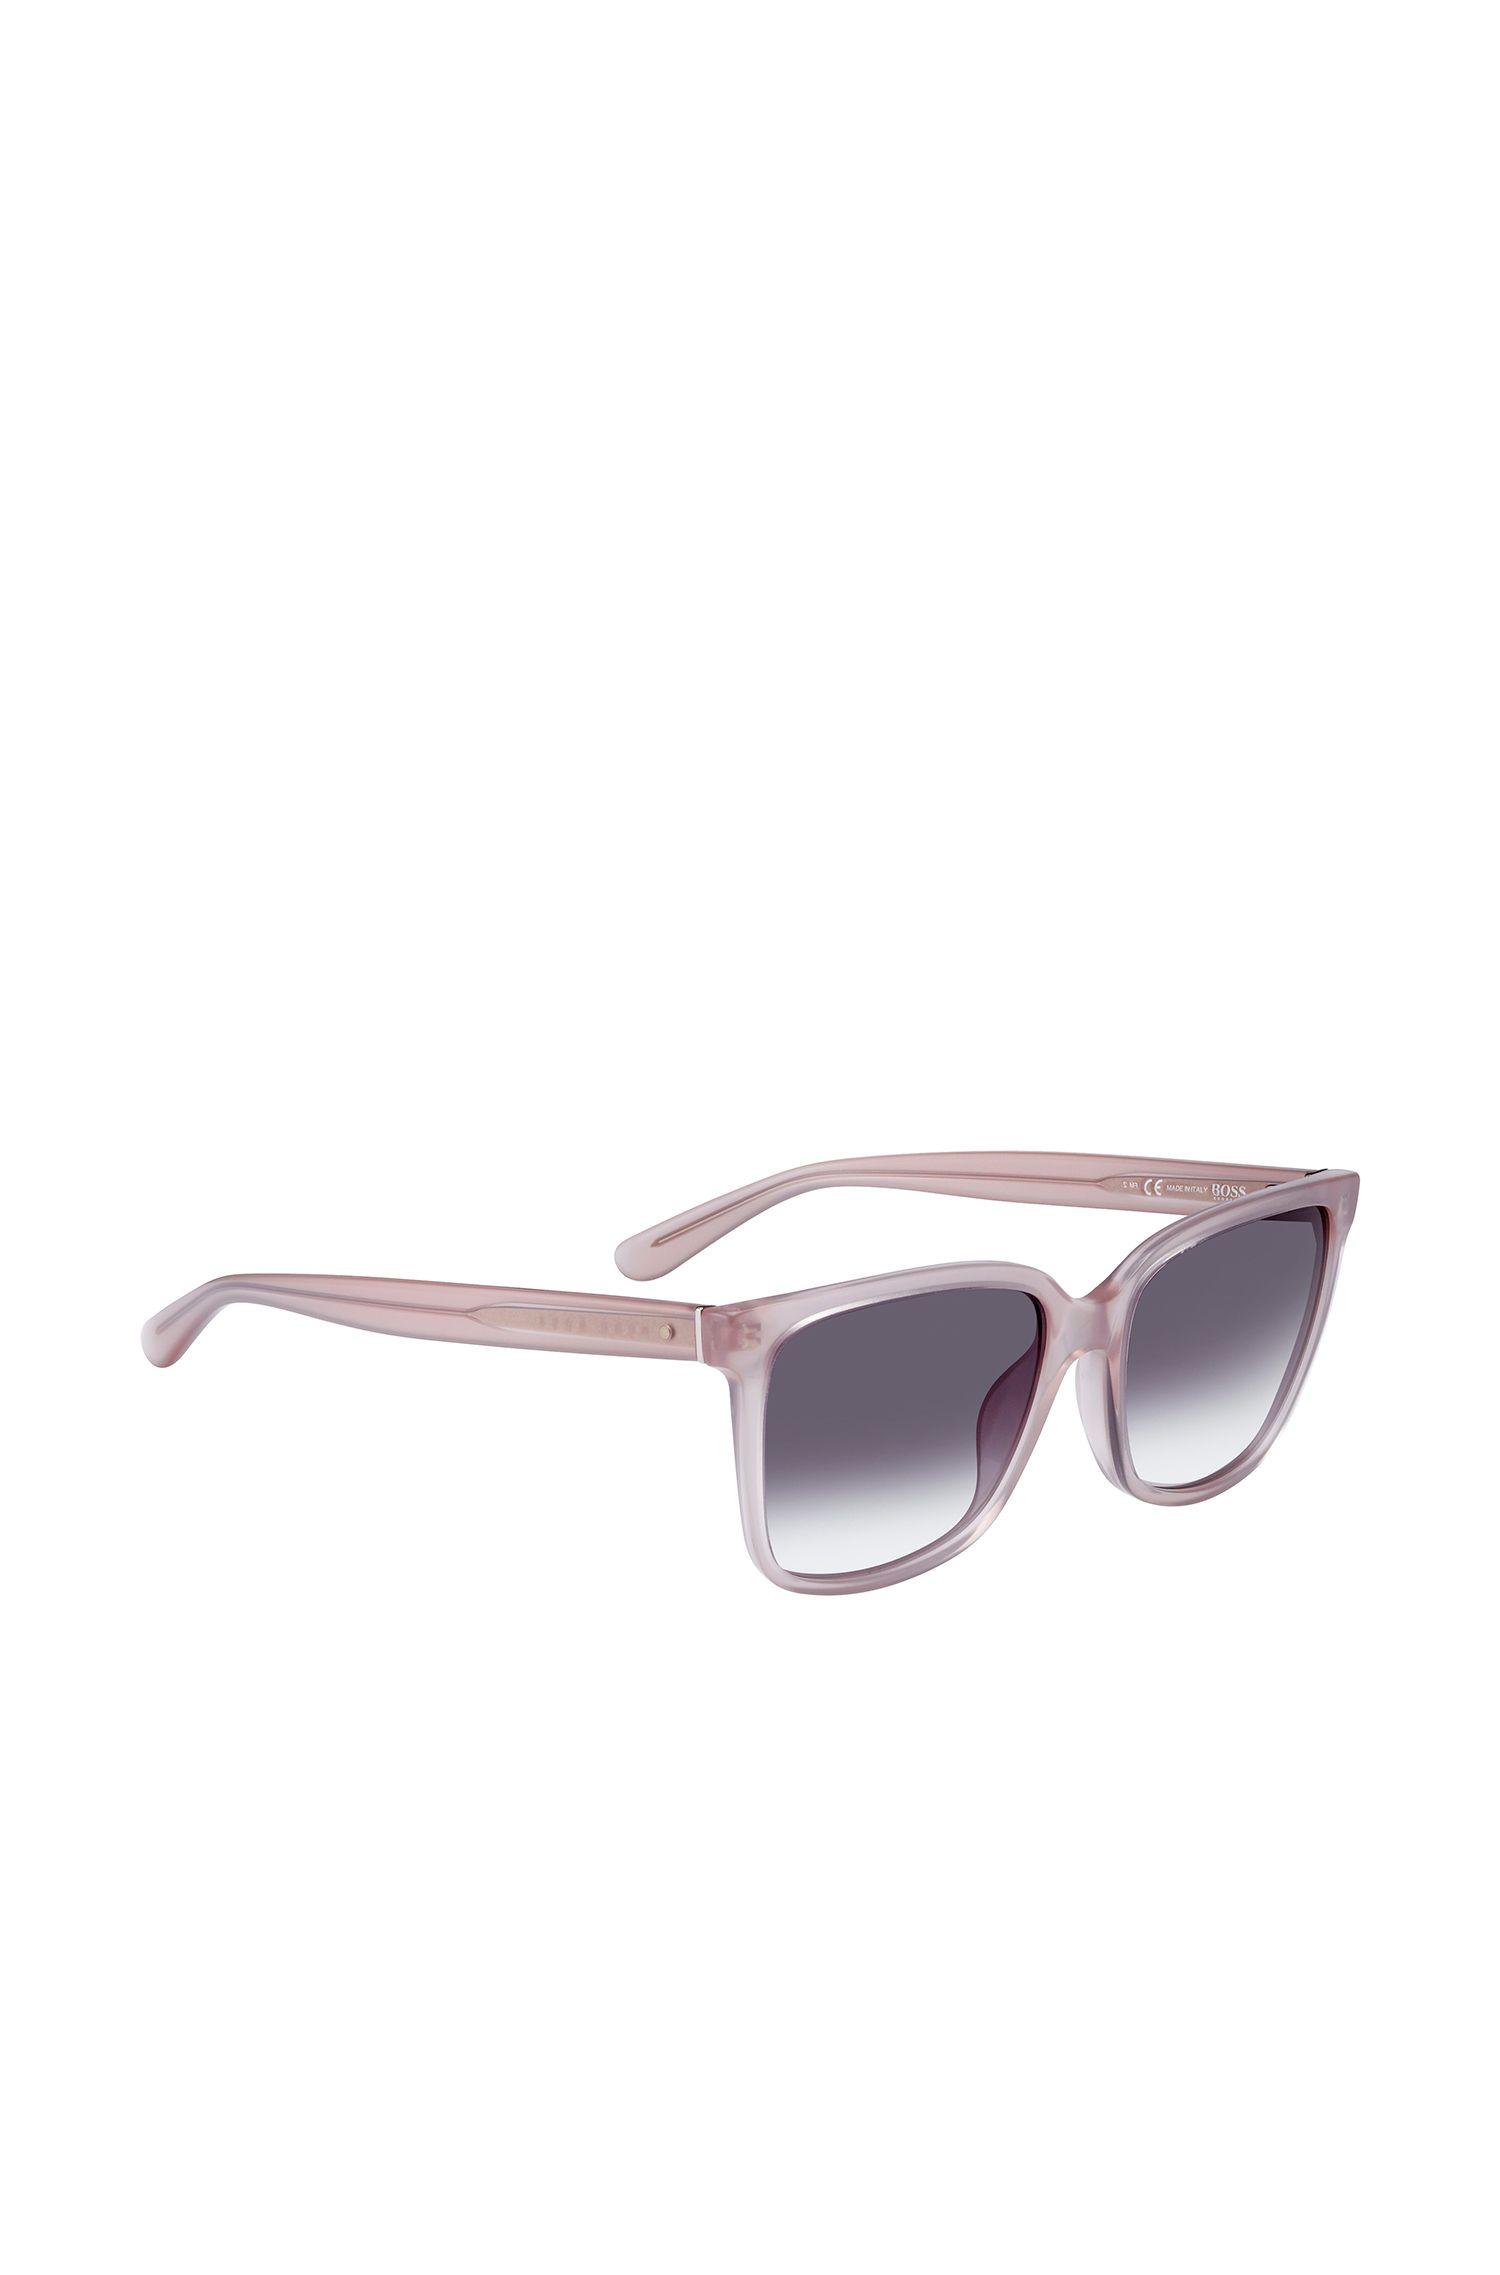 'BOSS 0787S' | Gray Gradient Lens Square Sunglasses